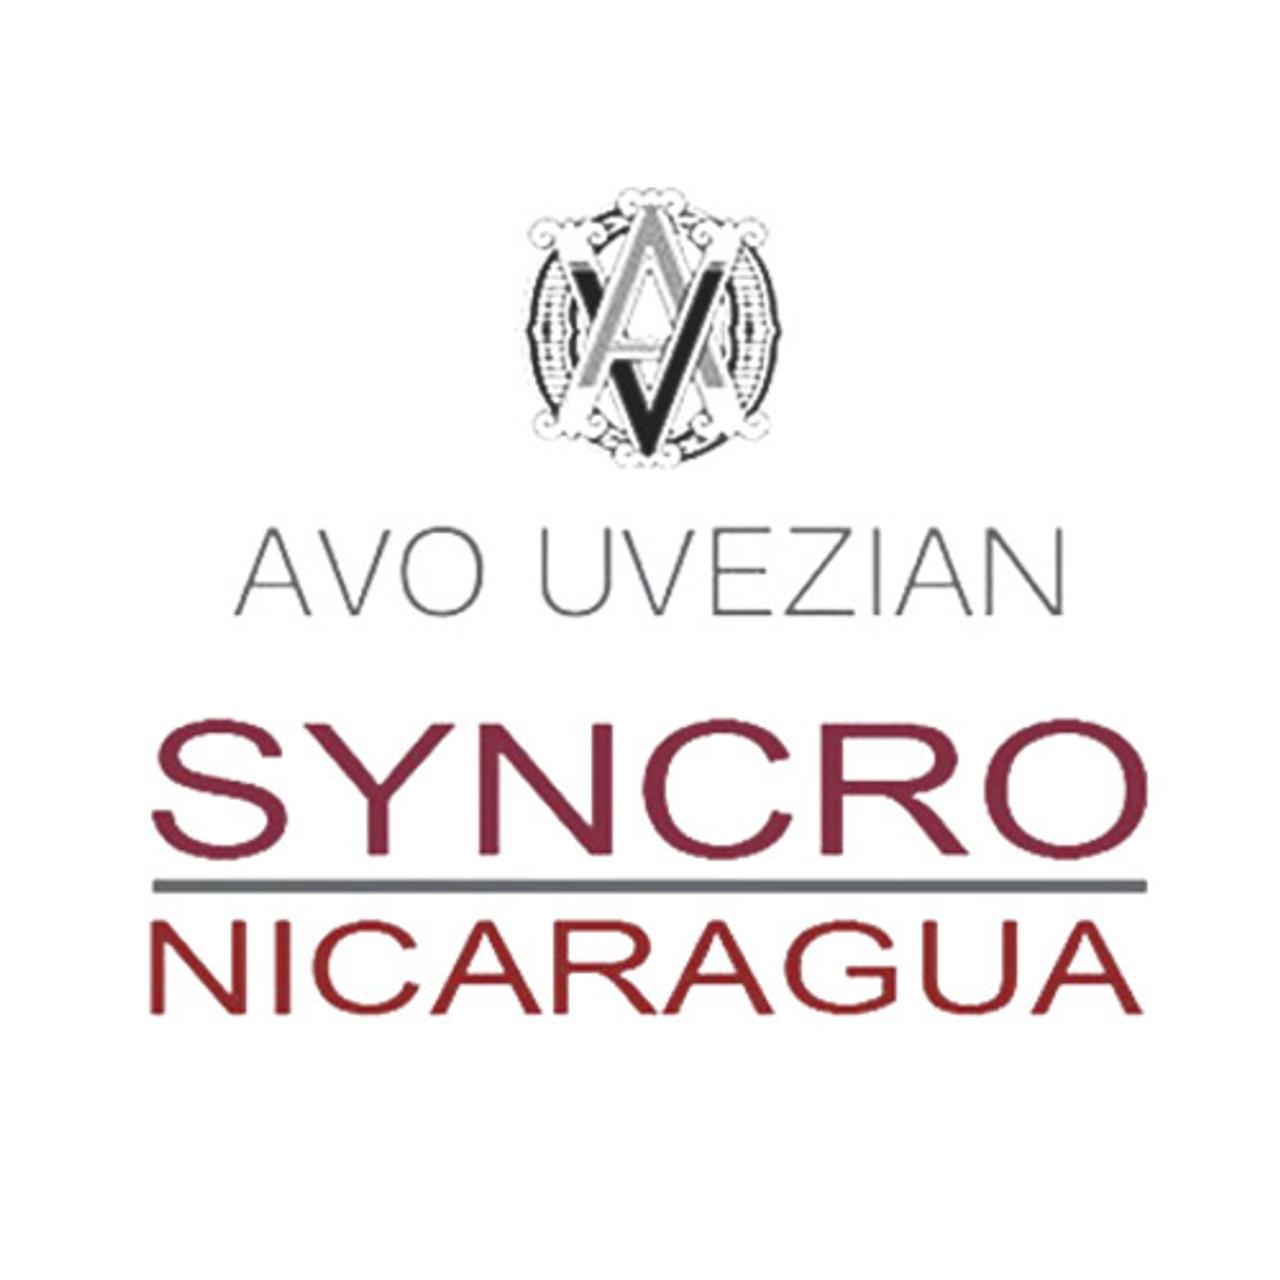 AVO Syncro Nicaragua Toro Cigars - 6 x 54 (Box of 20)